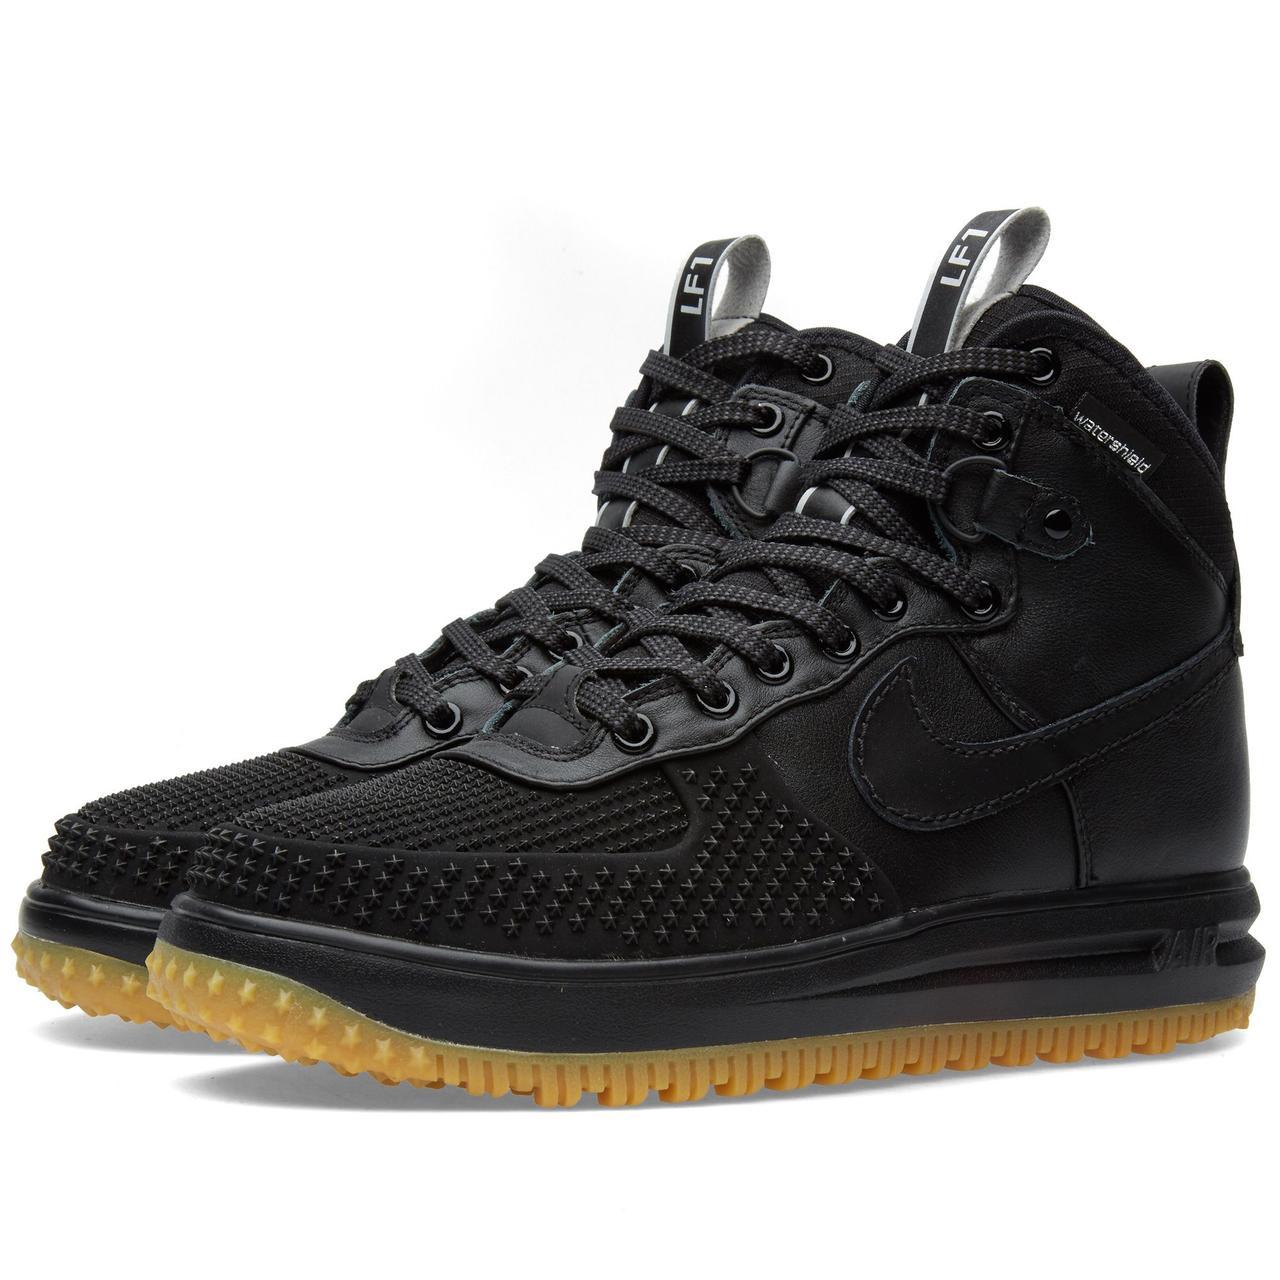 0f27d7424e4f Оригинальные кроссовки Nike Lunar Force 1 Duckboot Black - Sport-Sneakers -  Оригинальные кроссовки -